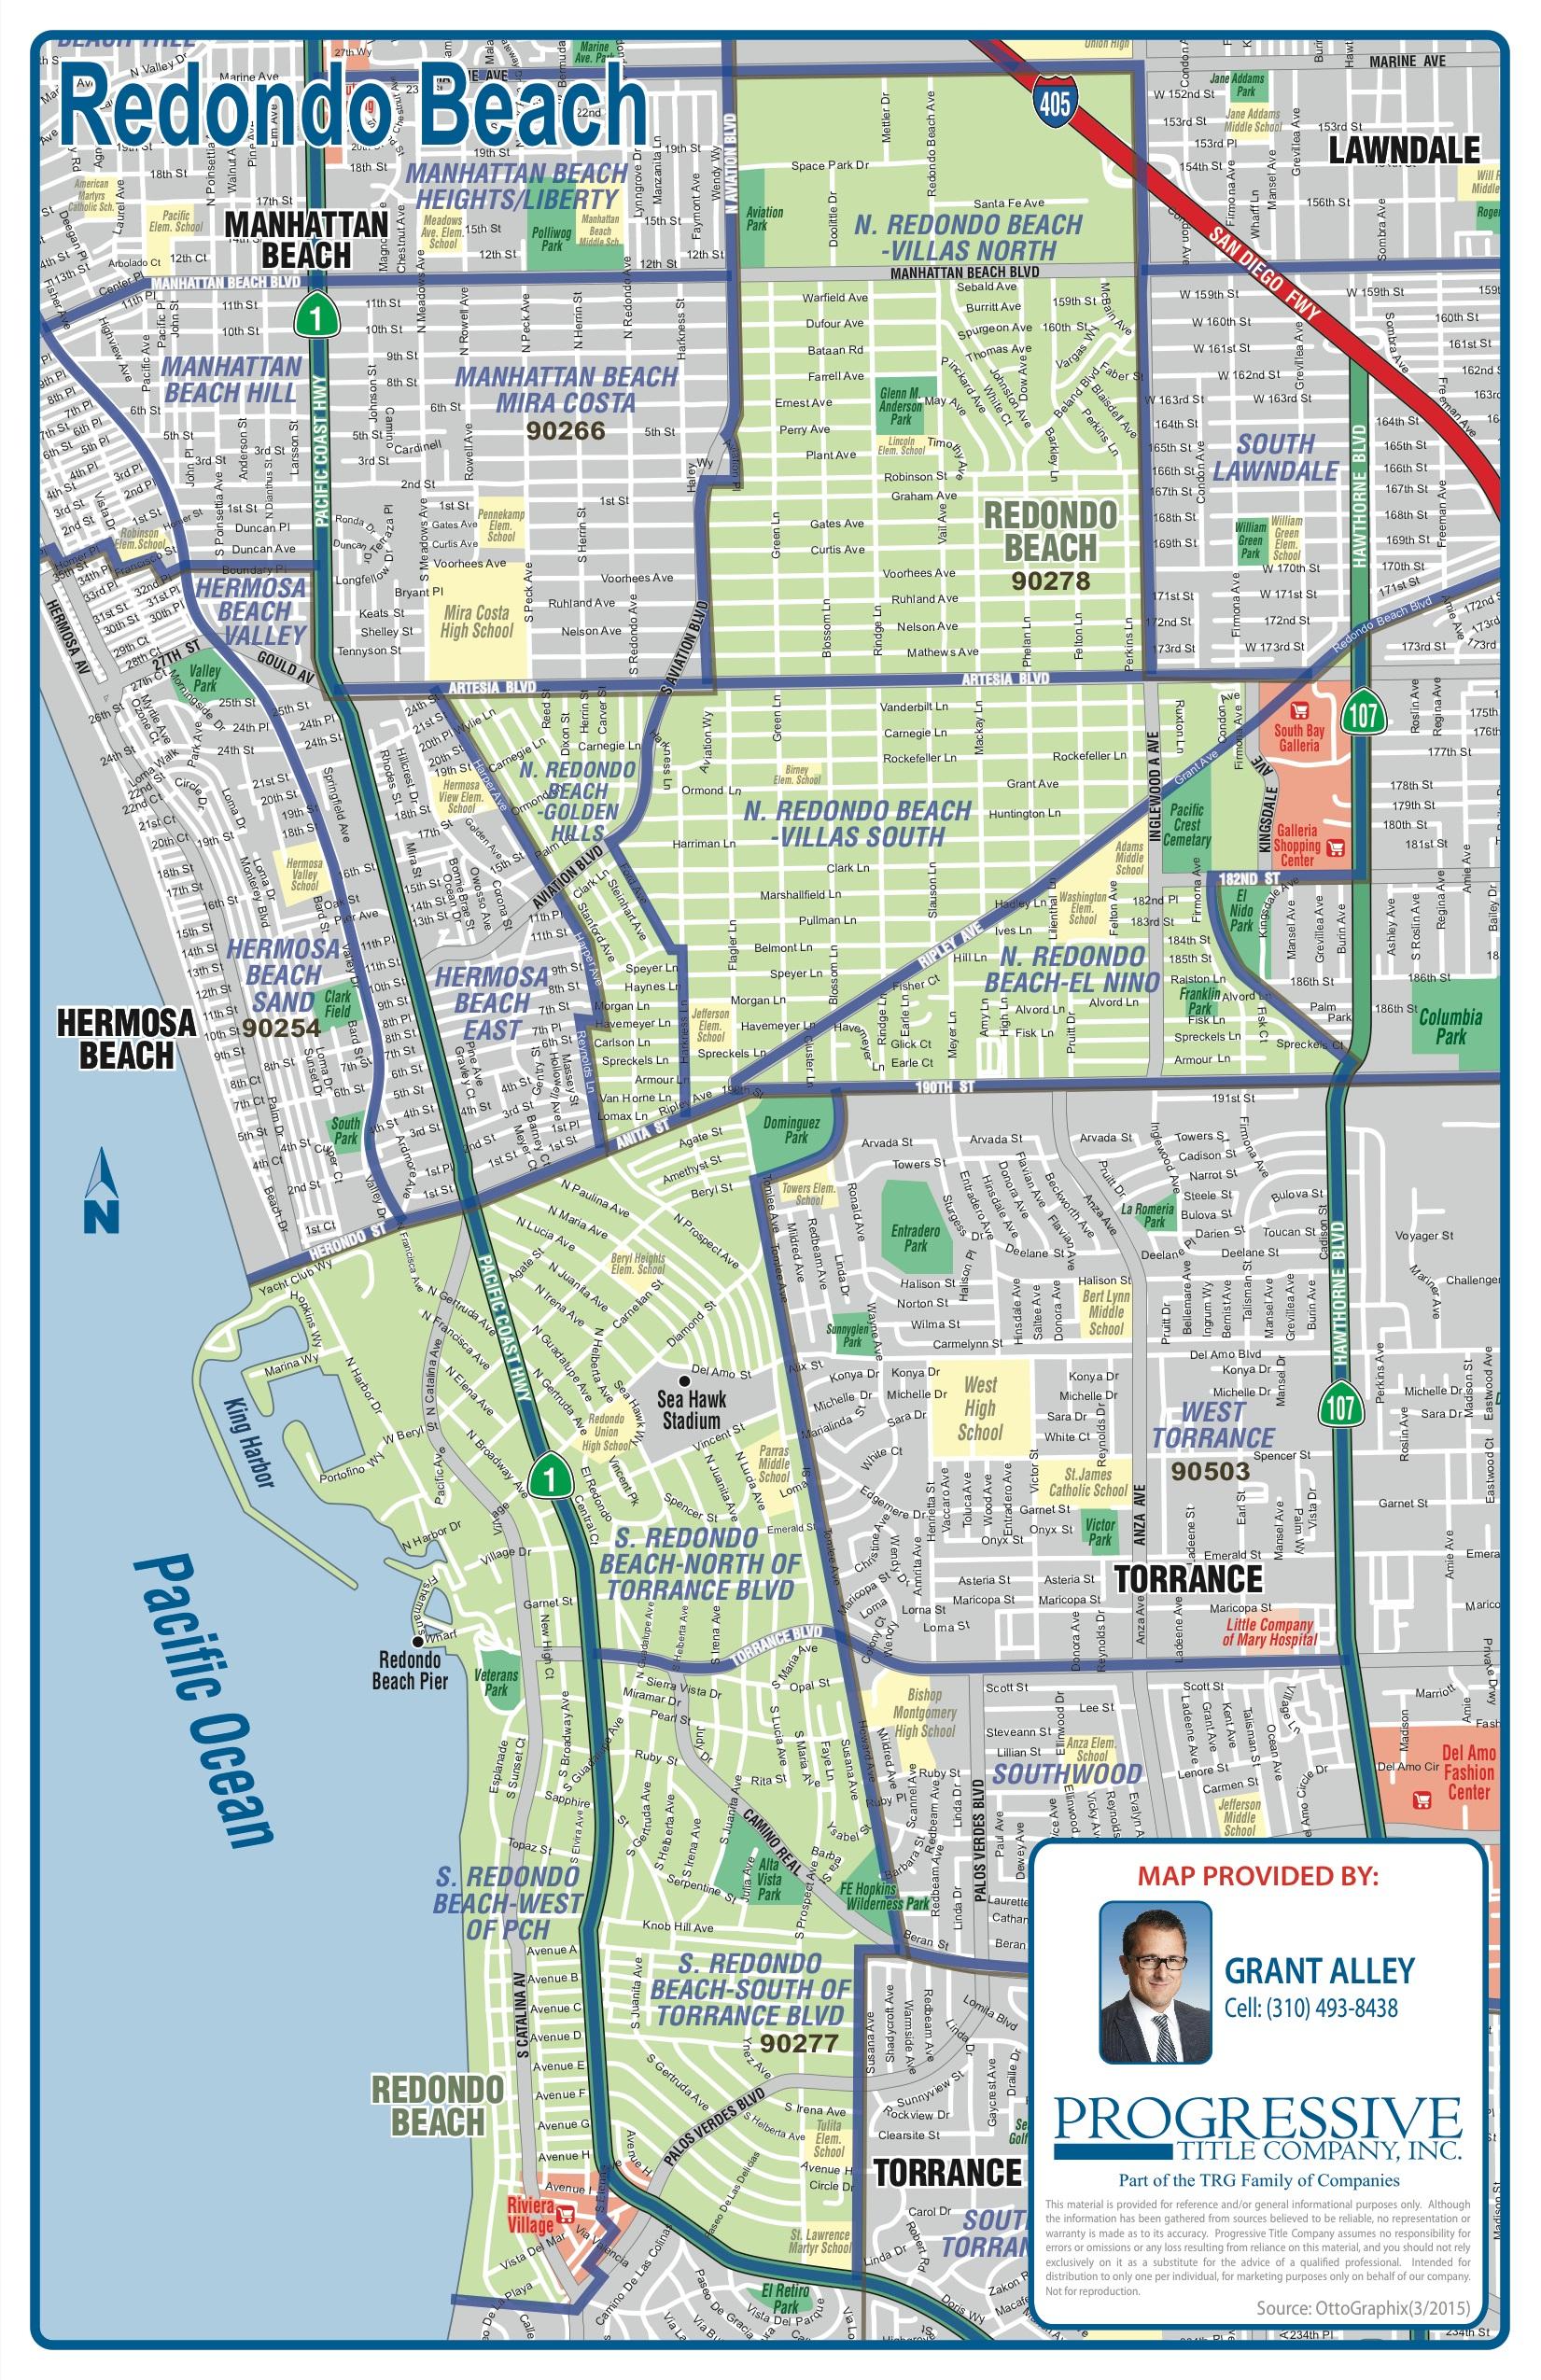 Real Estate Information For Redondo Beach CA